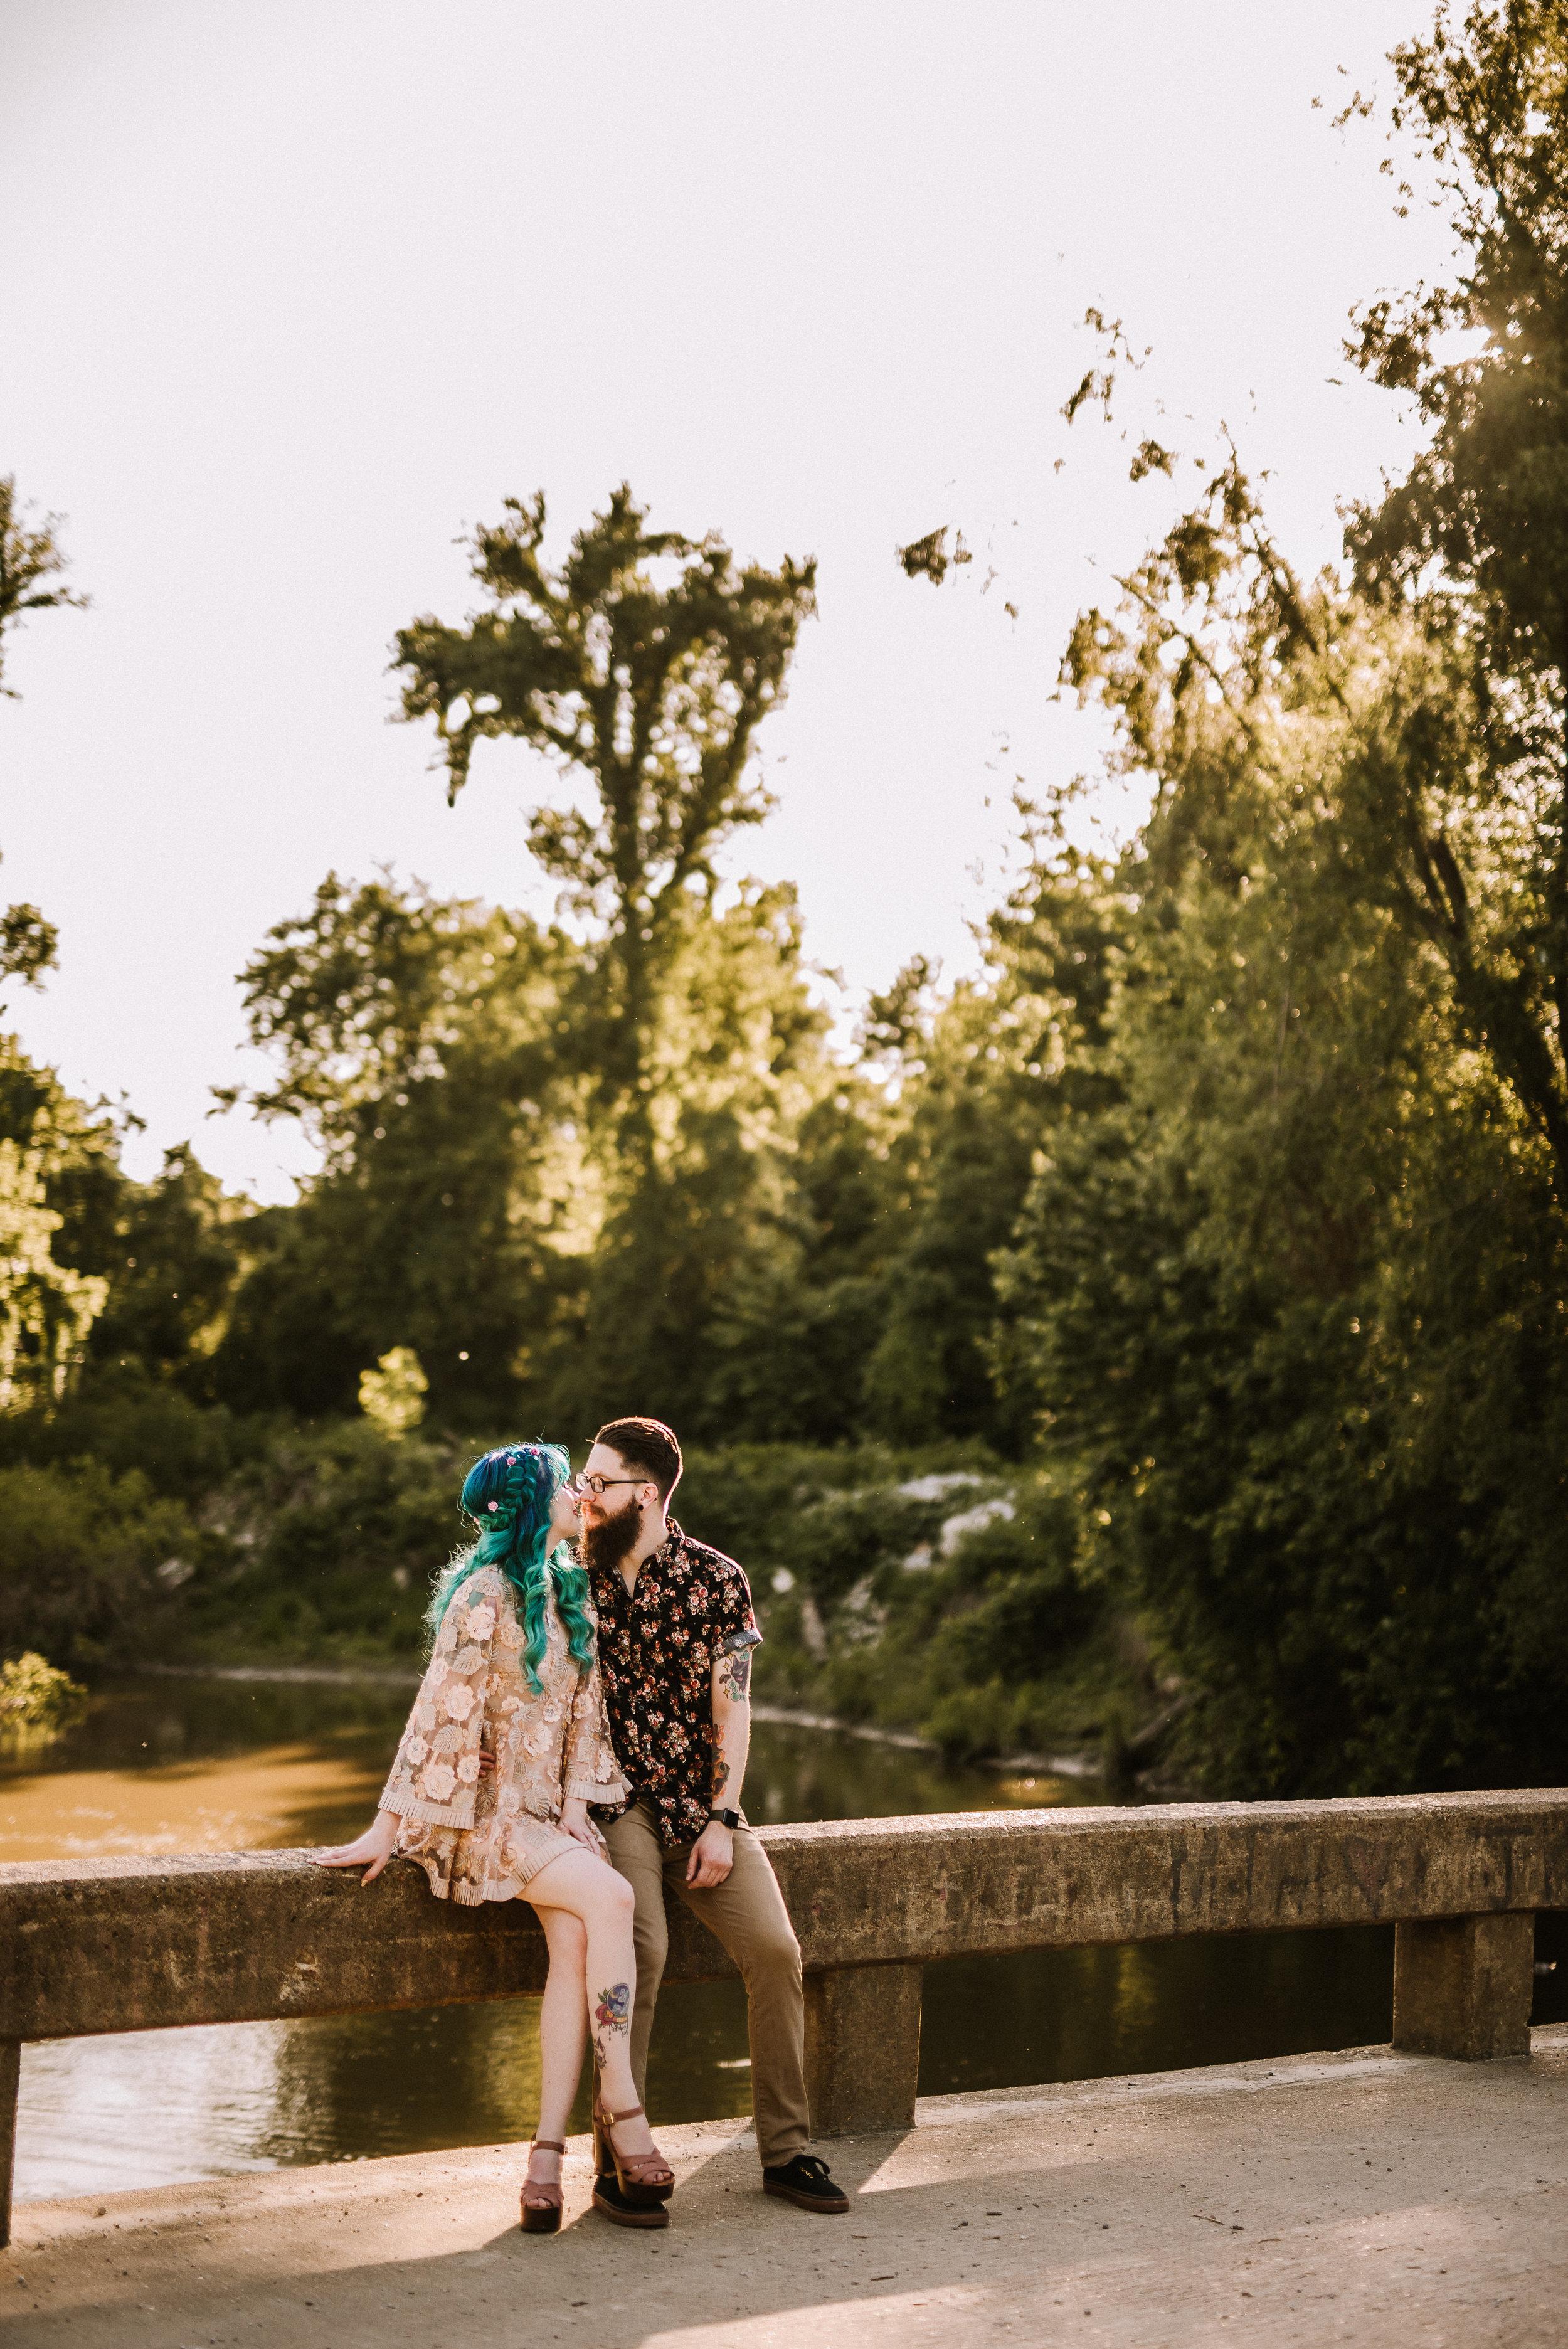 Kelly & Matt_Engagement Session_Wilson Arkansas_Ashley Benham Photography-137.jpg